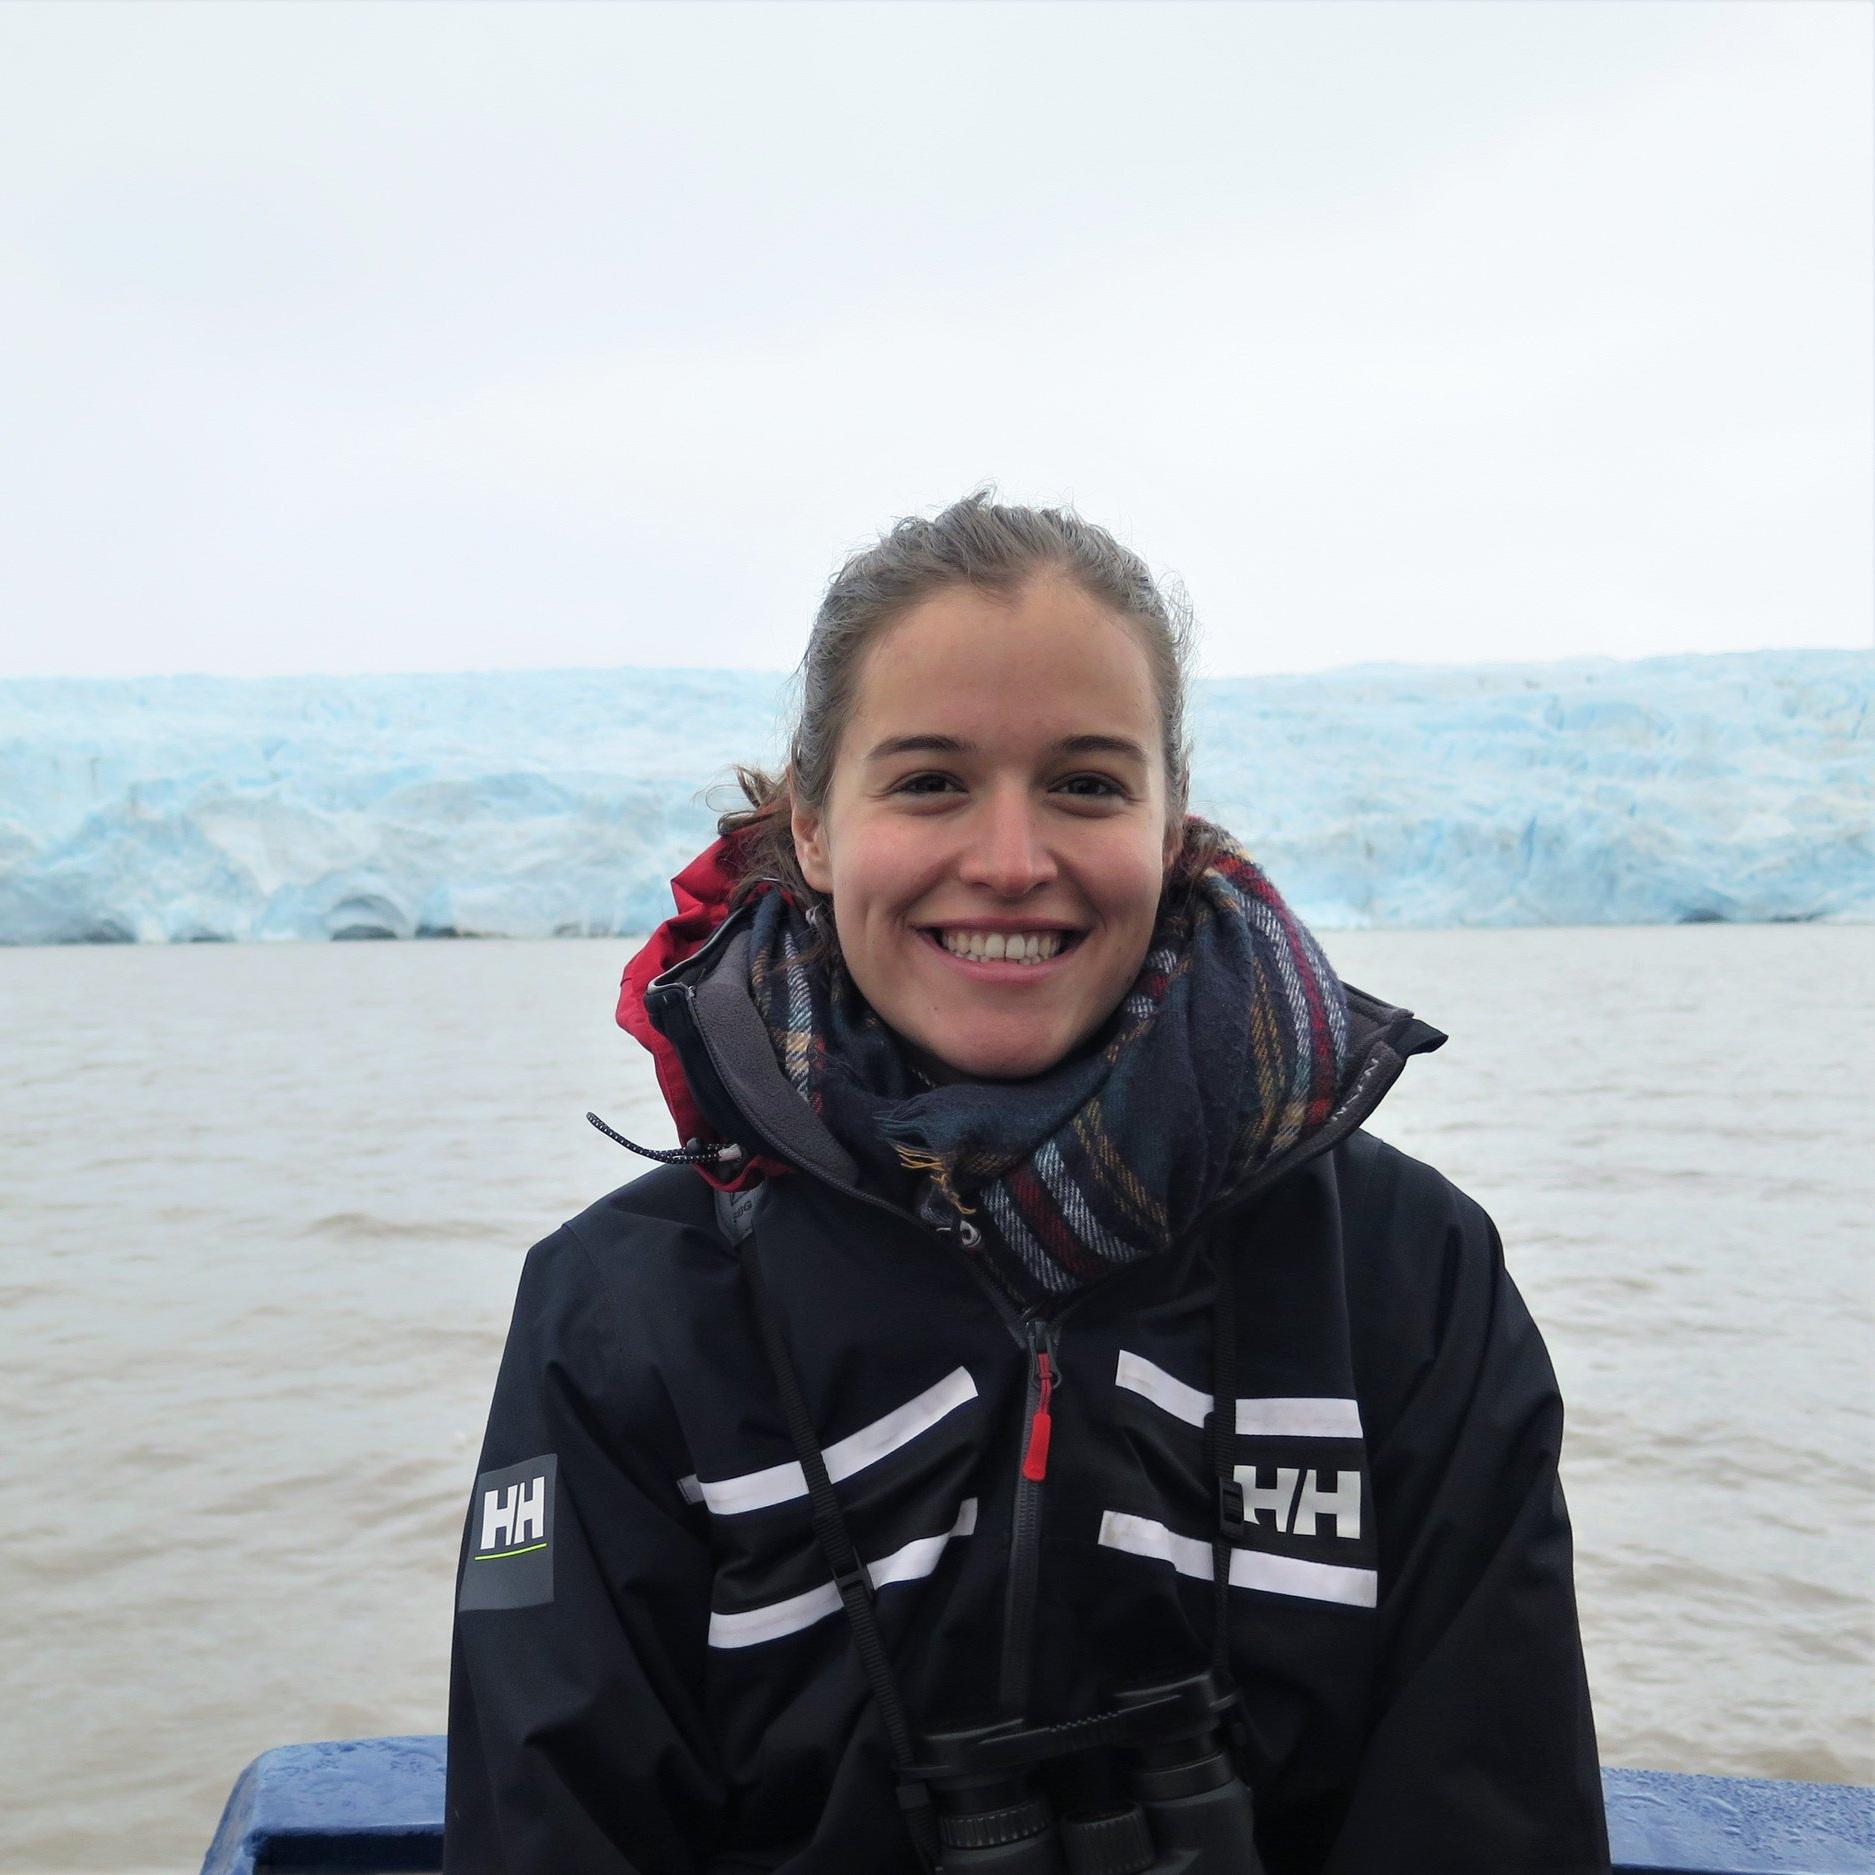 LENA NICOLA - Bachelor student (Geoecology, University of Potsdam)Topic: Ice-drainage basins in Antarctica